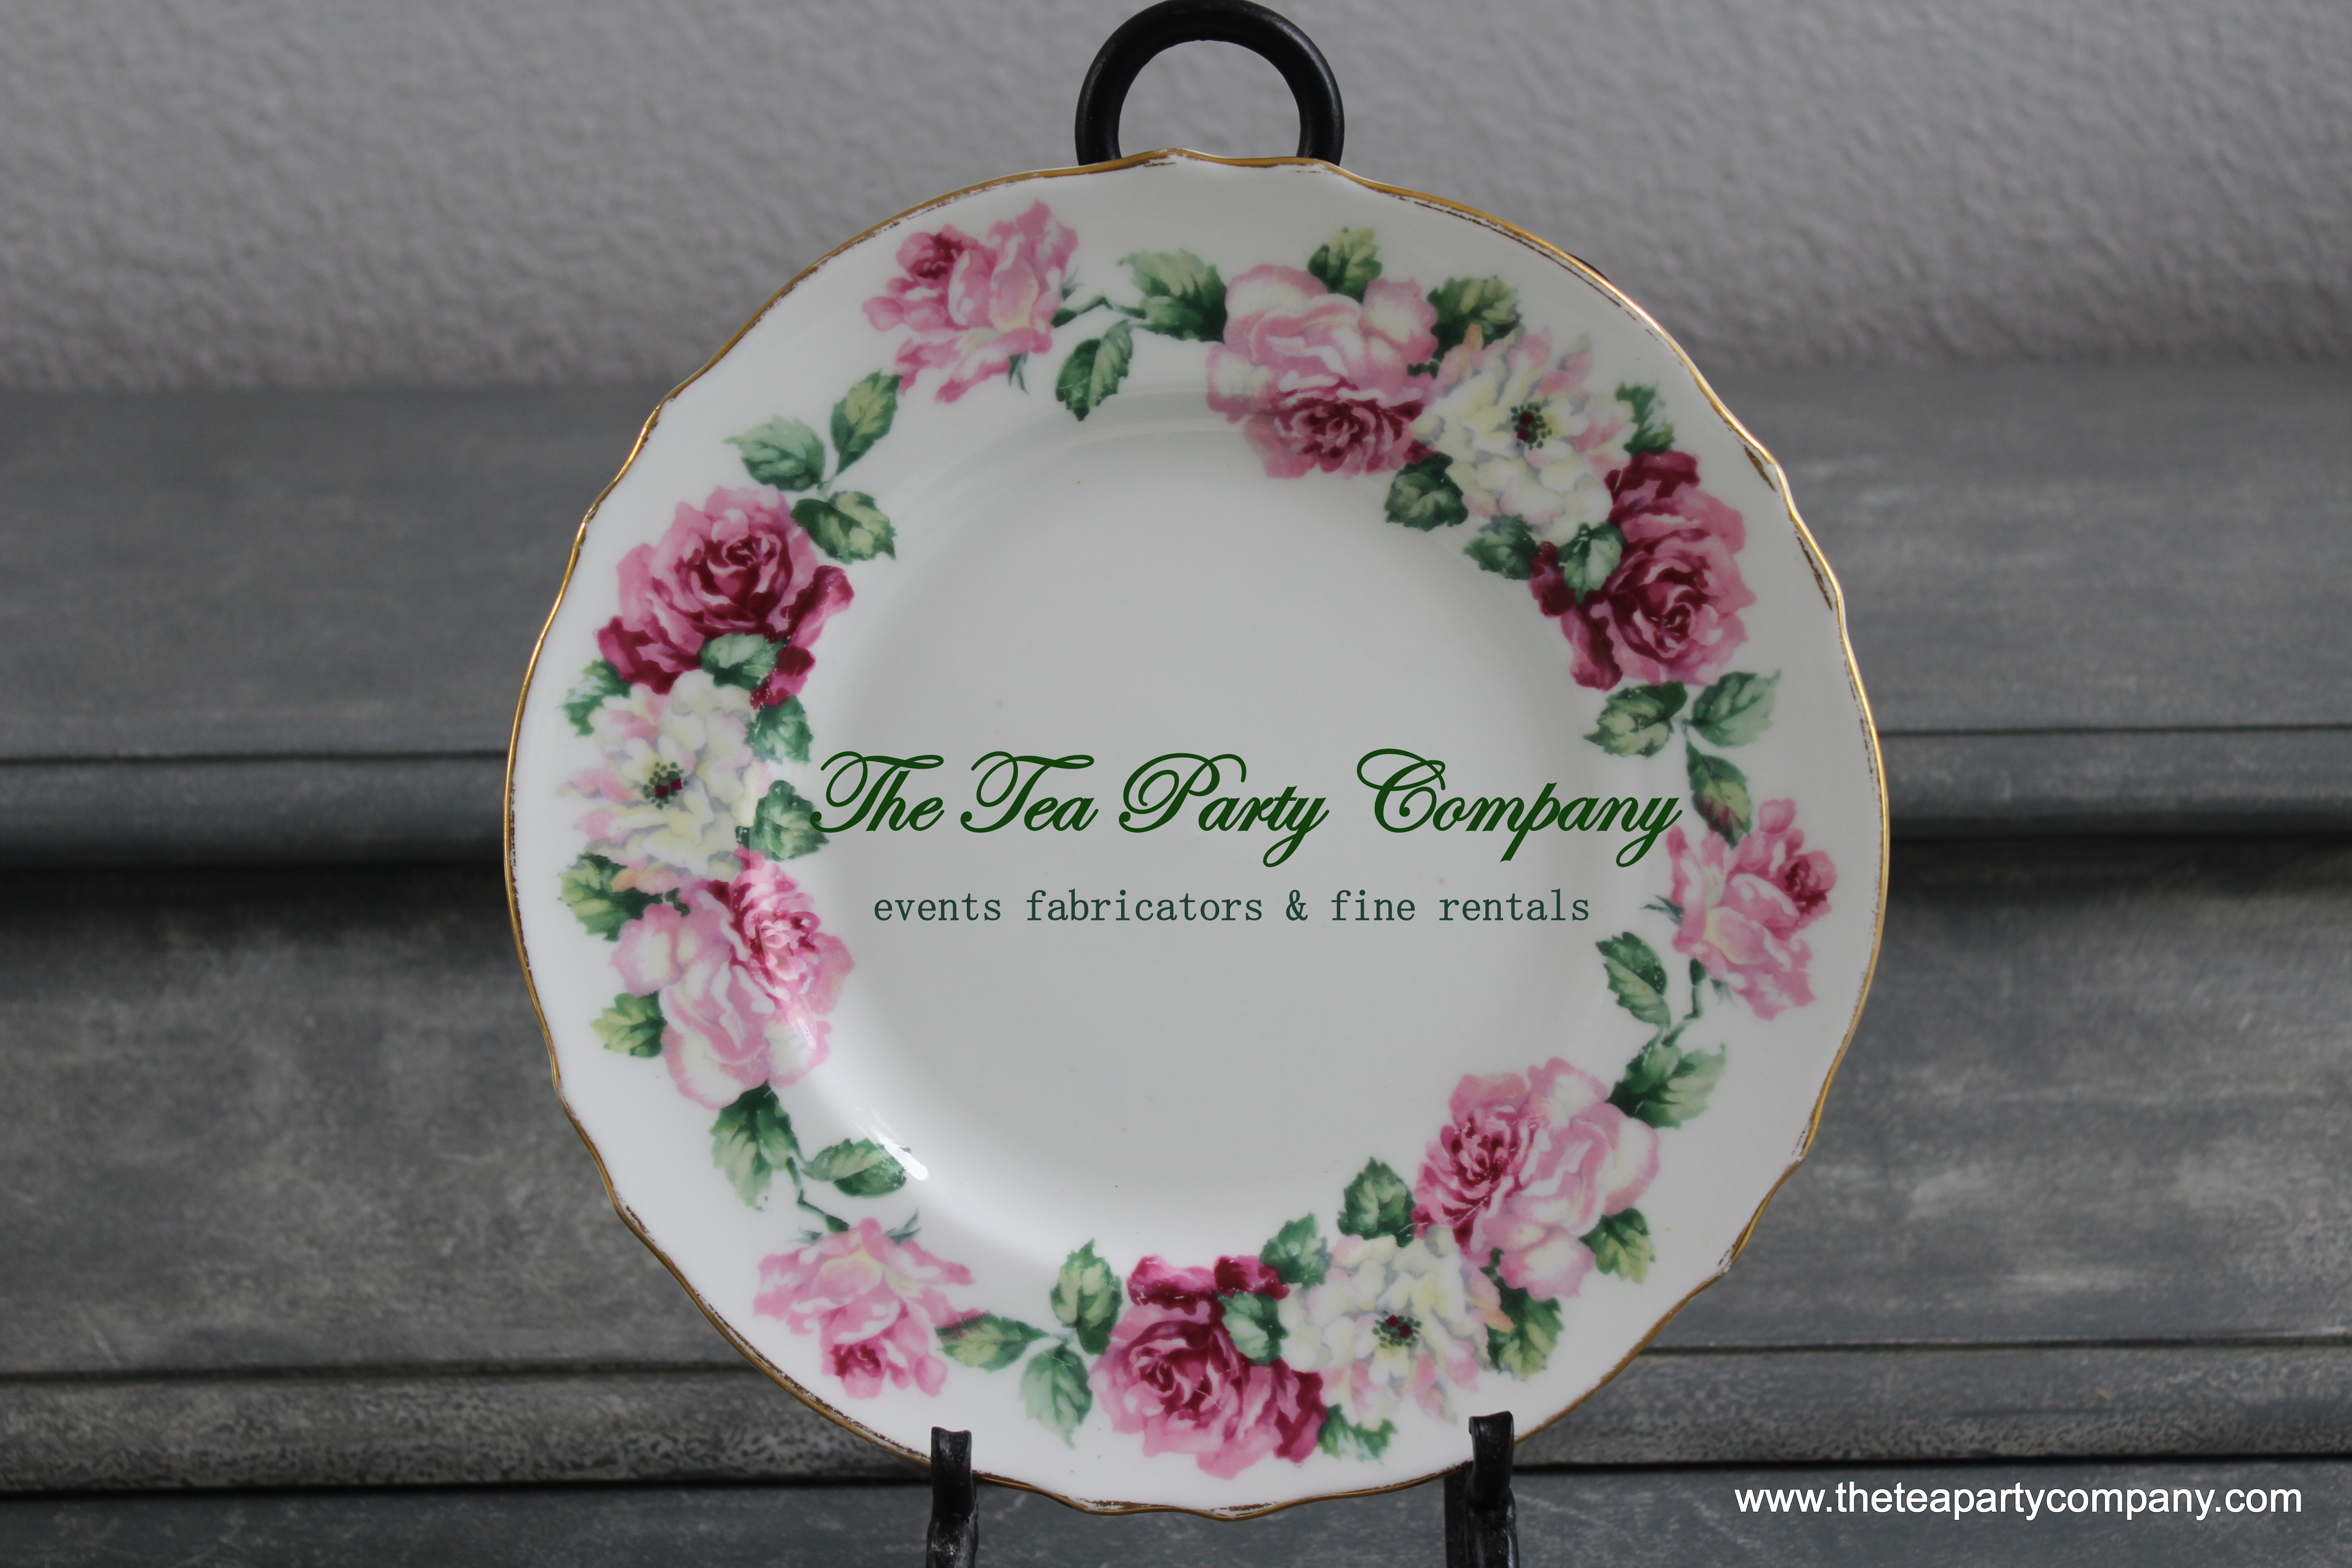 Mismatch Salad Plates The Tea Party Company (4)